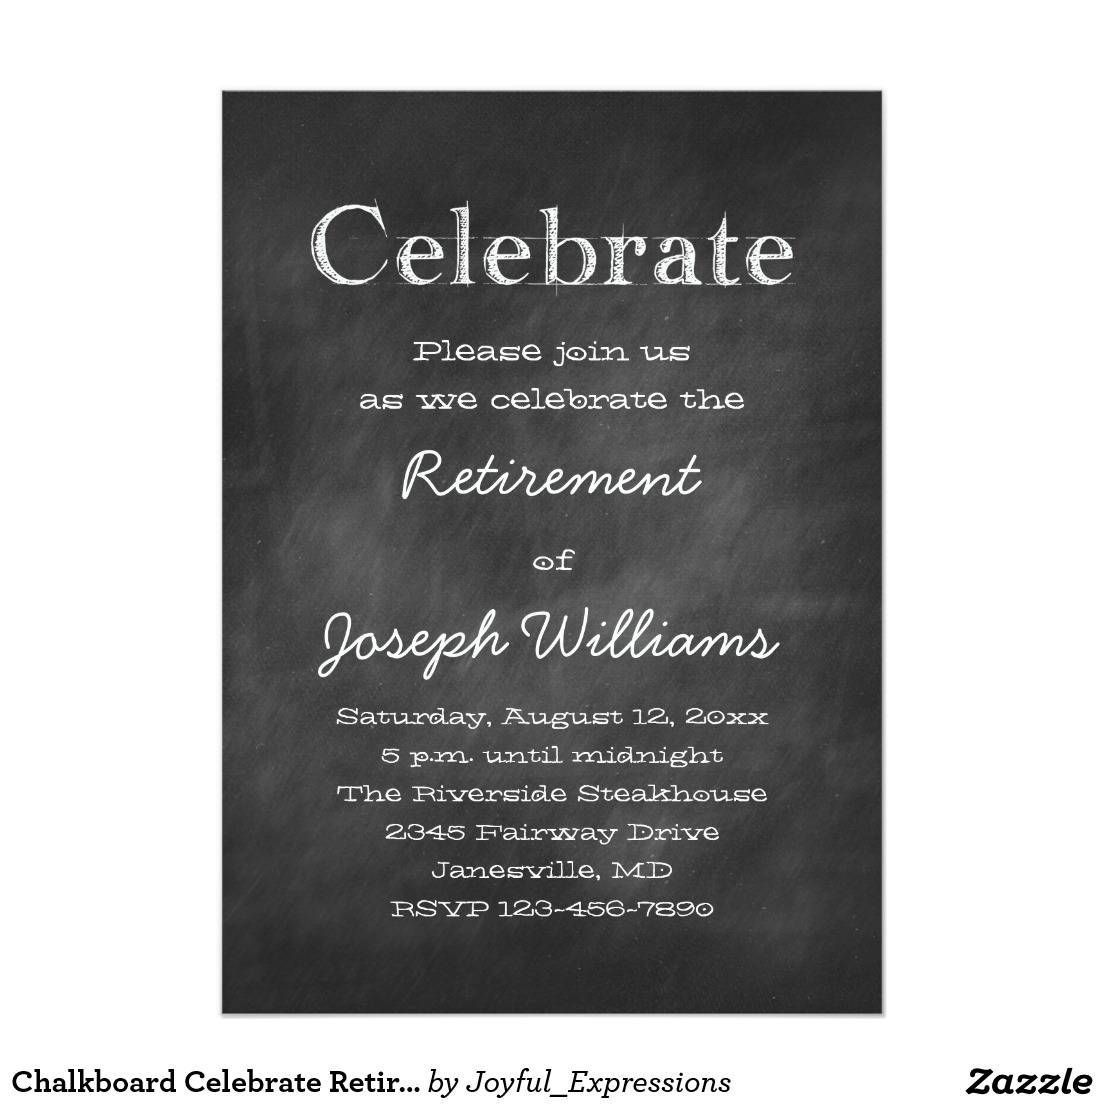 003 Top Retirement Party Invitation Template Free Idea  M WordFull